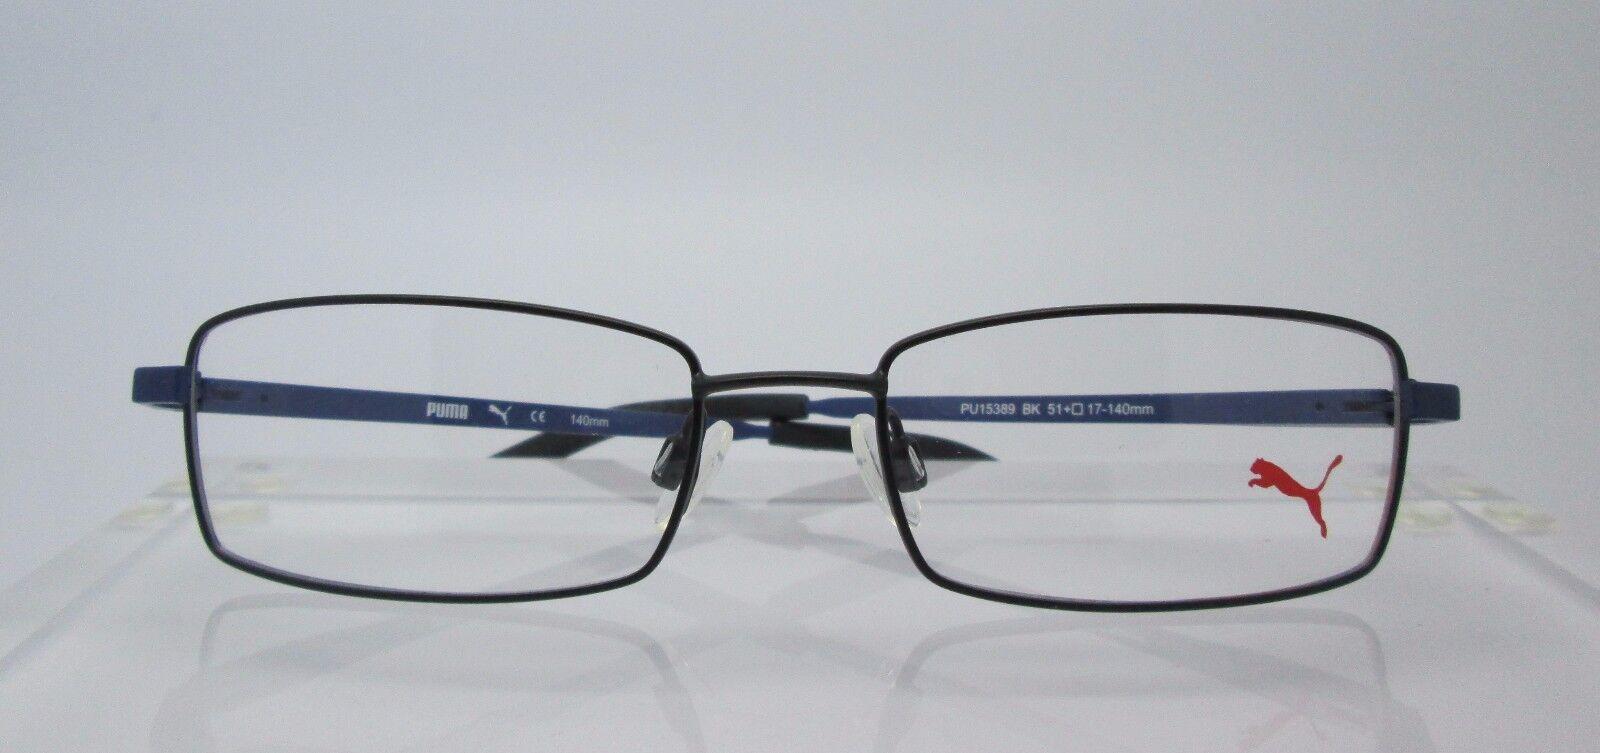 PUMA 15389 Black Eyeglass Frames Glasses Mens Womens   eBay